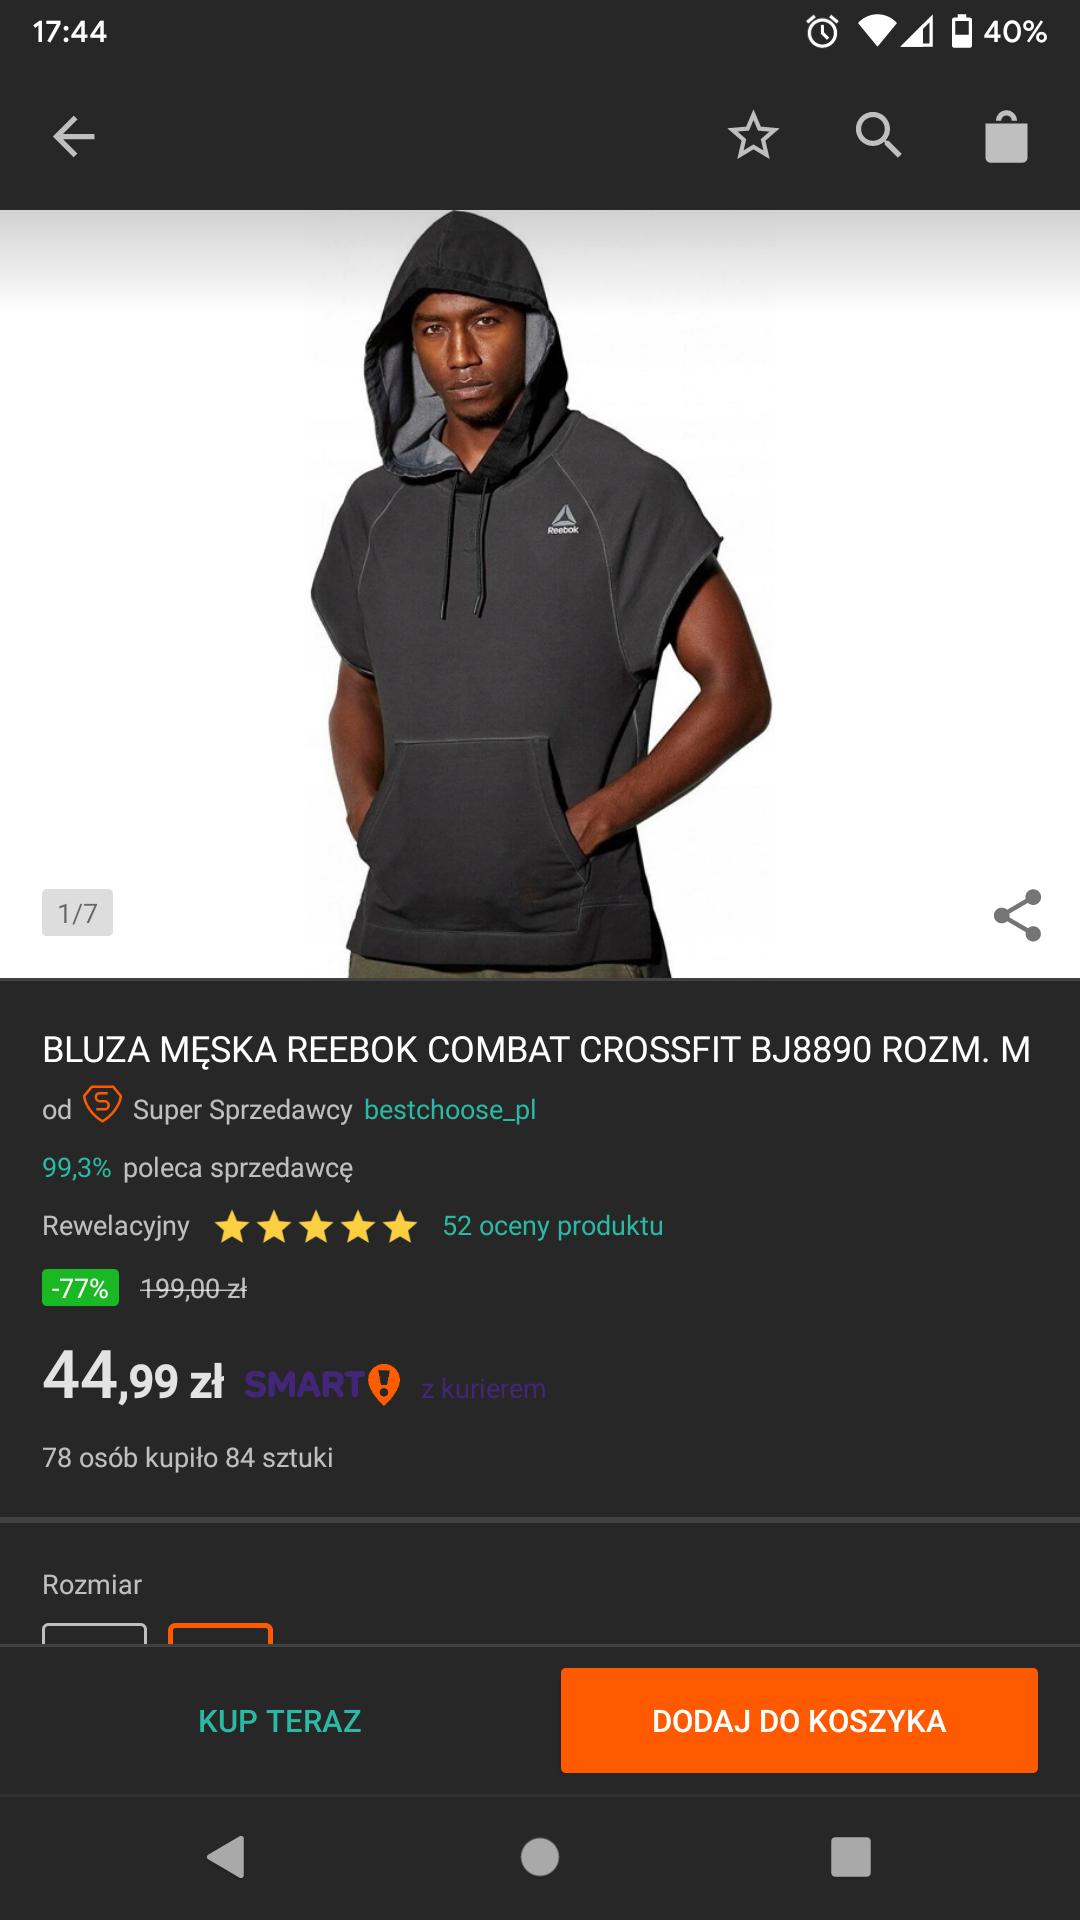 Bluza Reebok Combat Crossfit